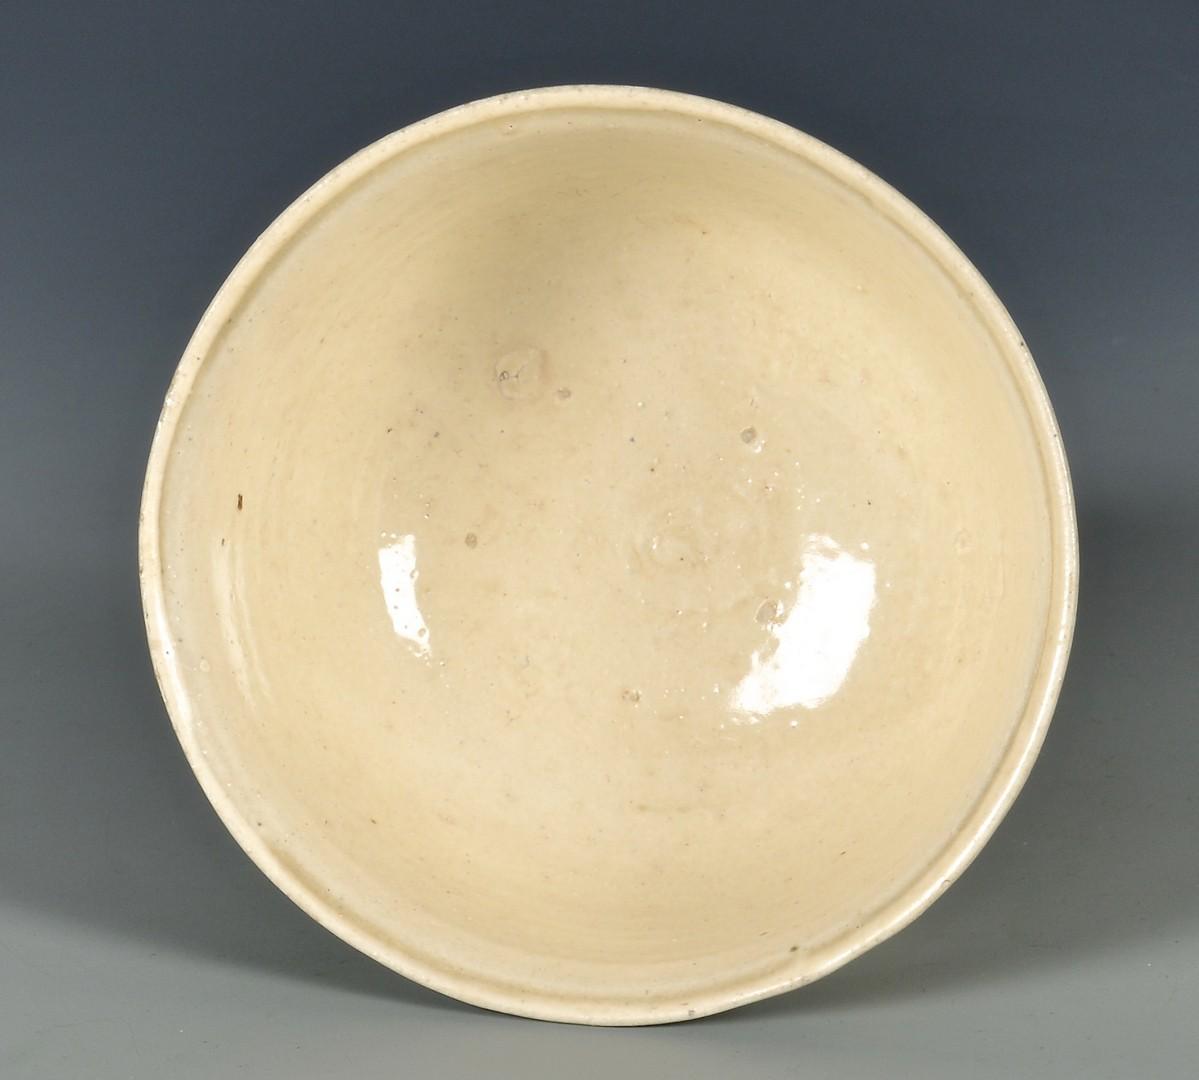 Lot 377: Chinese Song Dynasty Cizhou Glaze Stem Cup